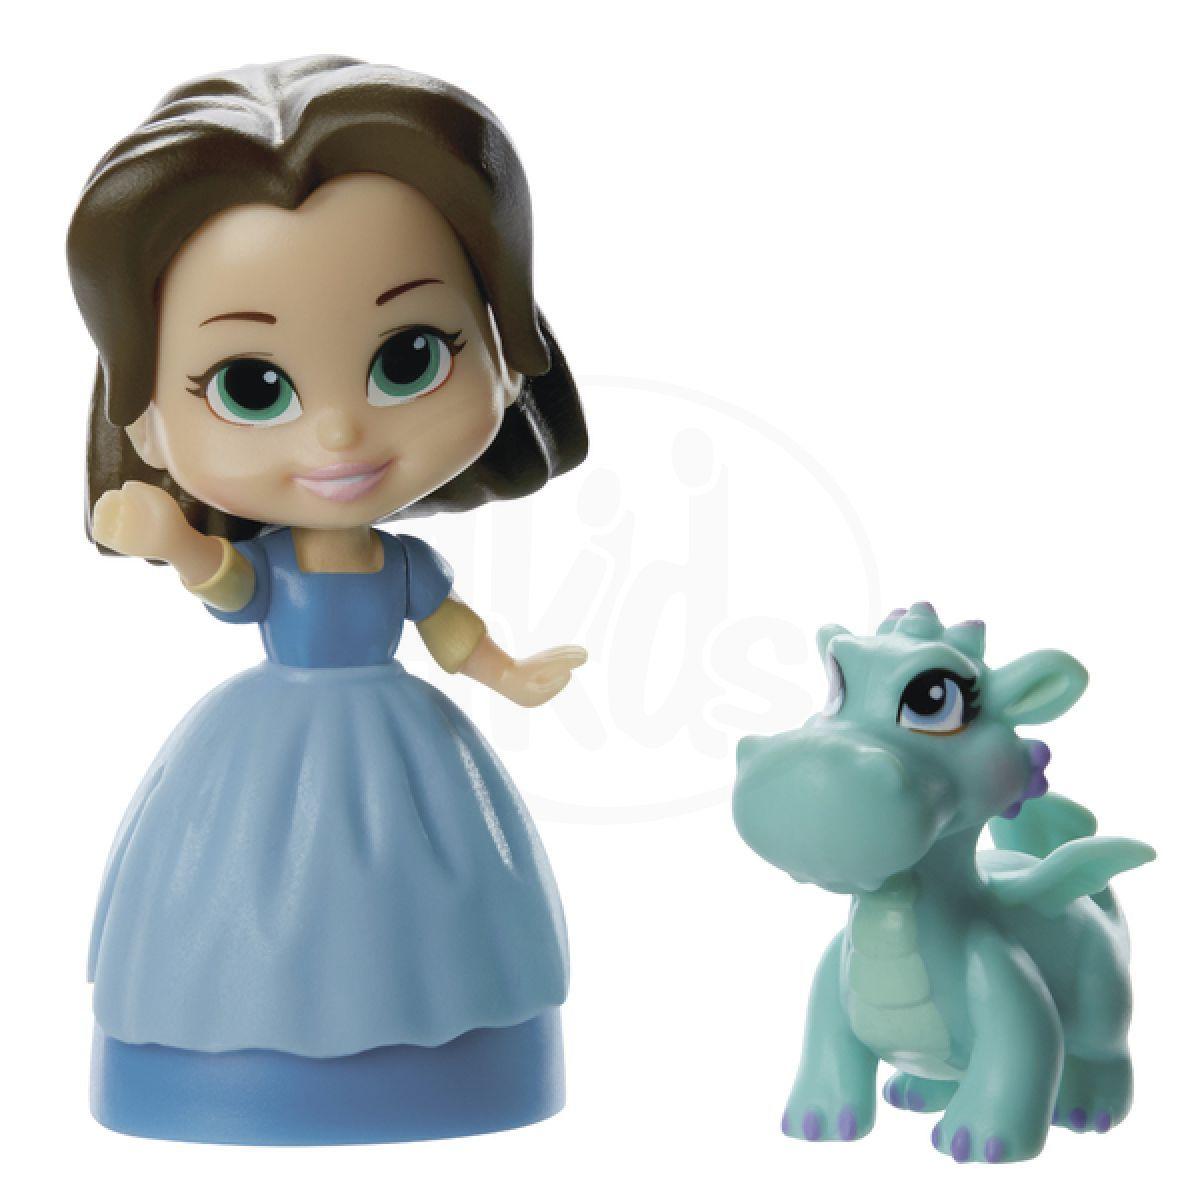 Jakks Pacific Disney Mini princezna a kamarád - Jade and Crackle